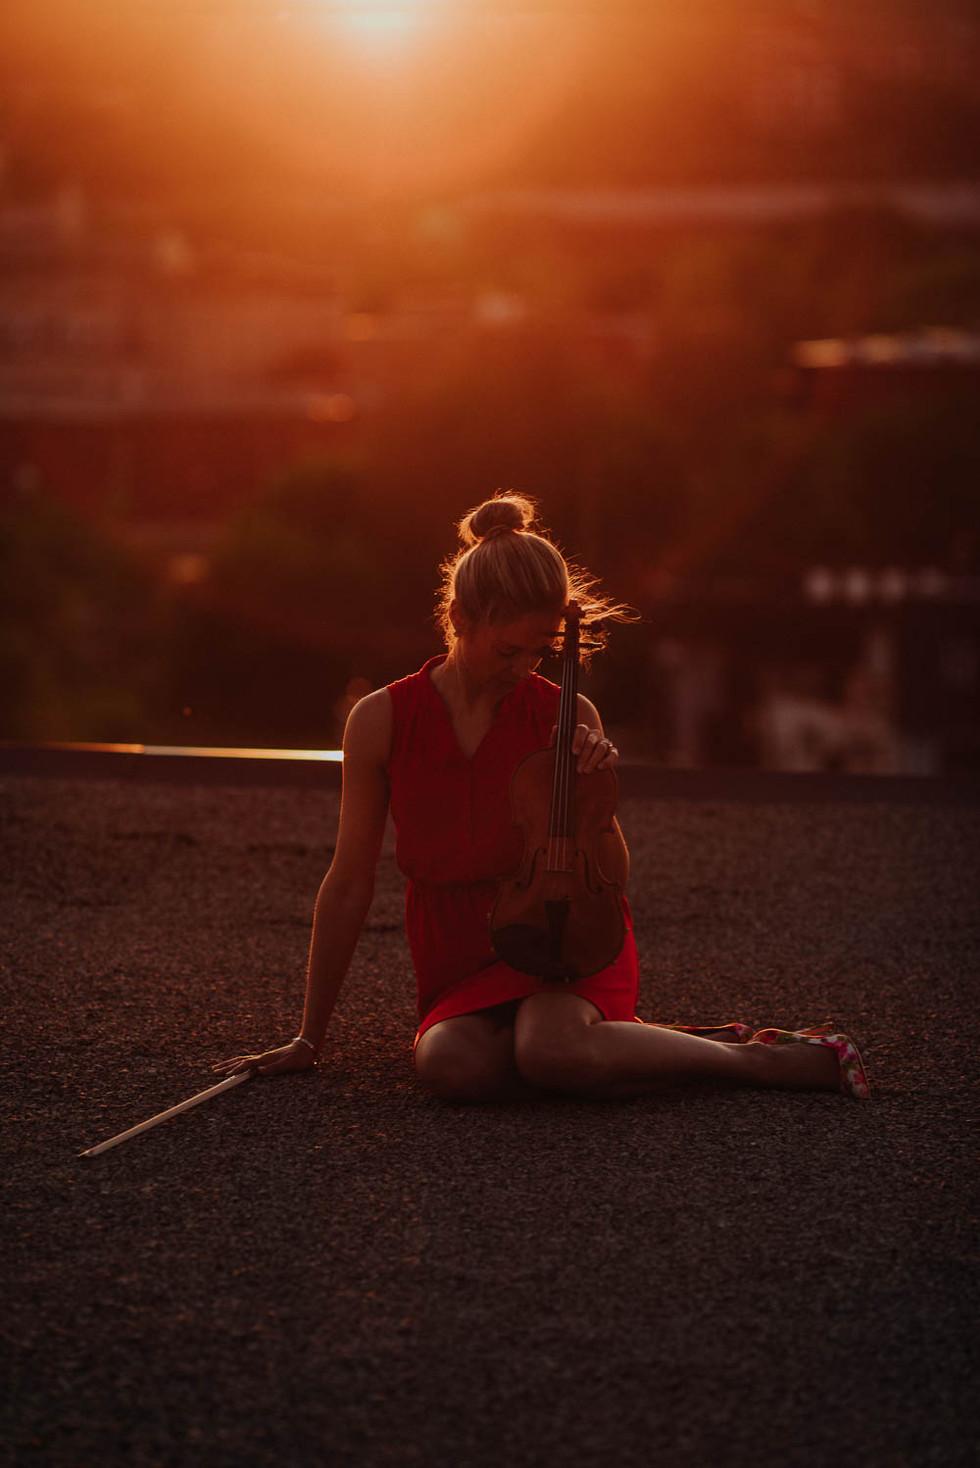 BonnallieBrodeur-photo-portrait-artiste-